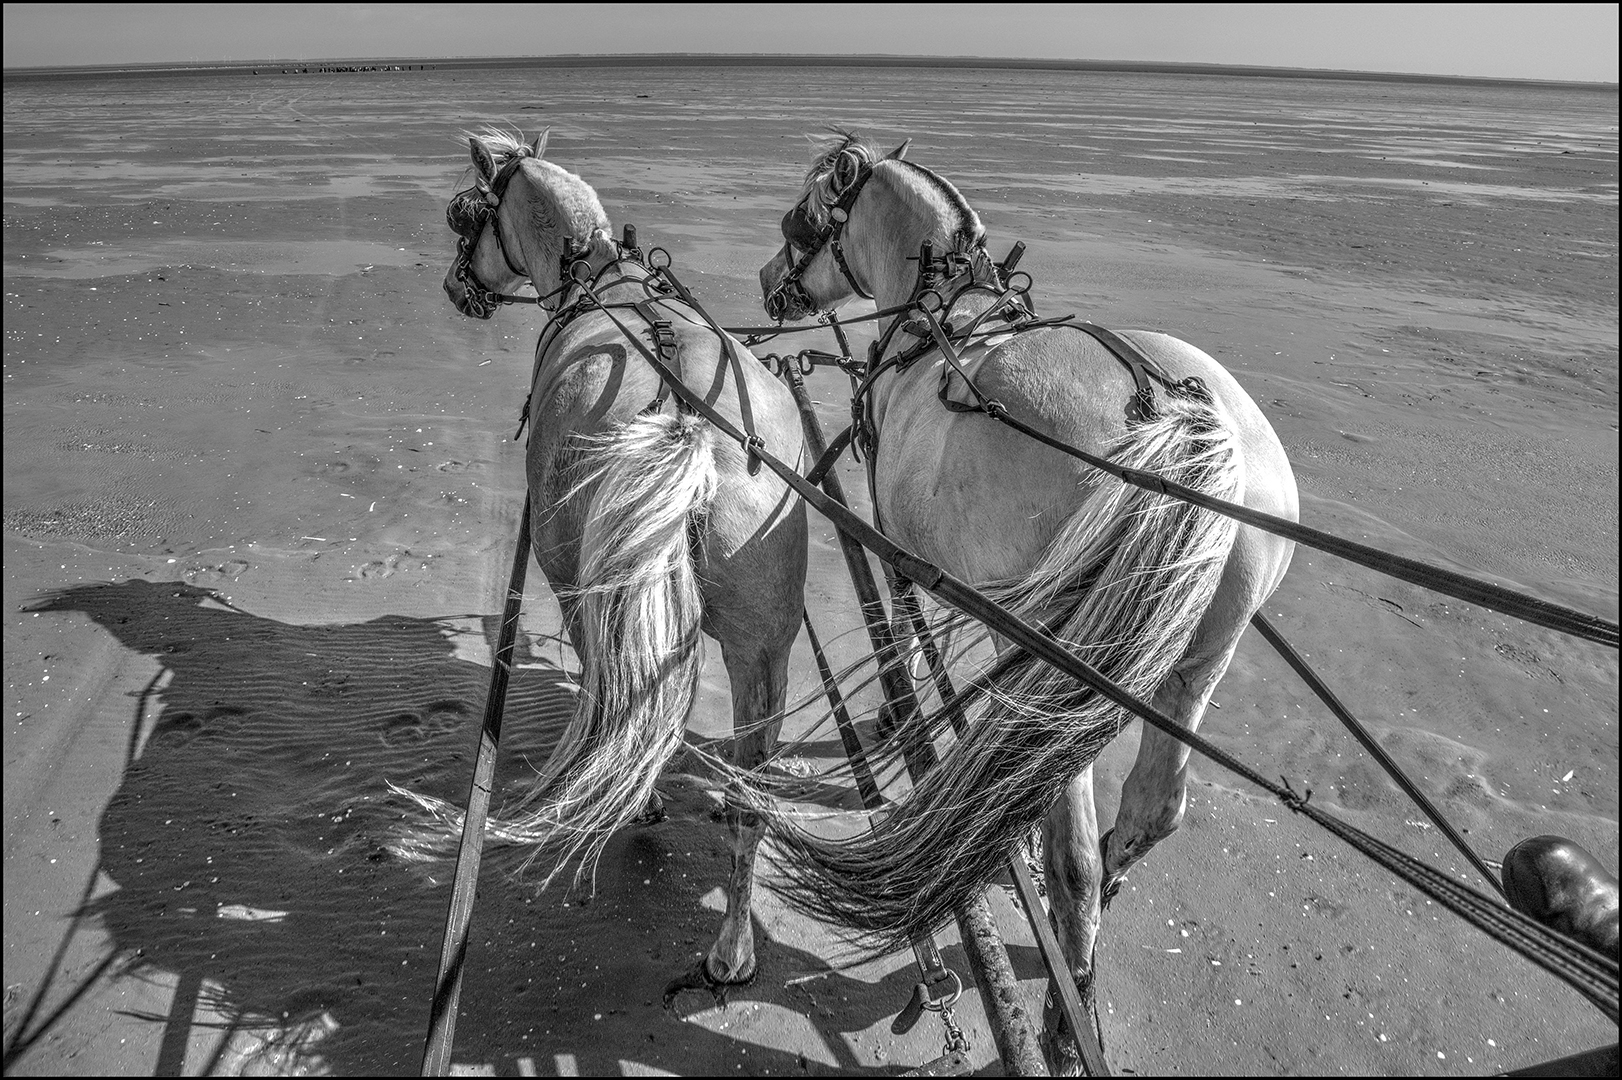 Papir 3. plads Tage Christiansen Heste